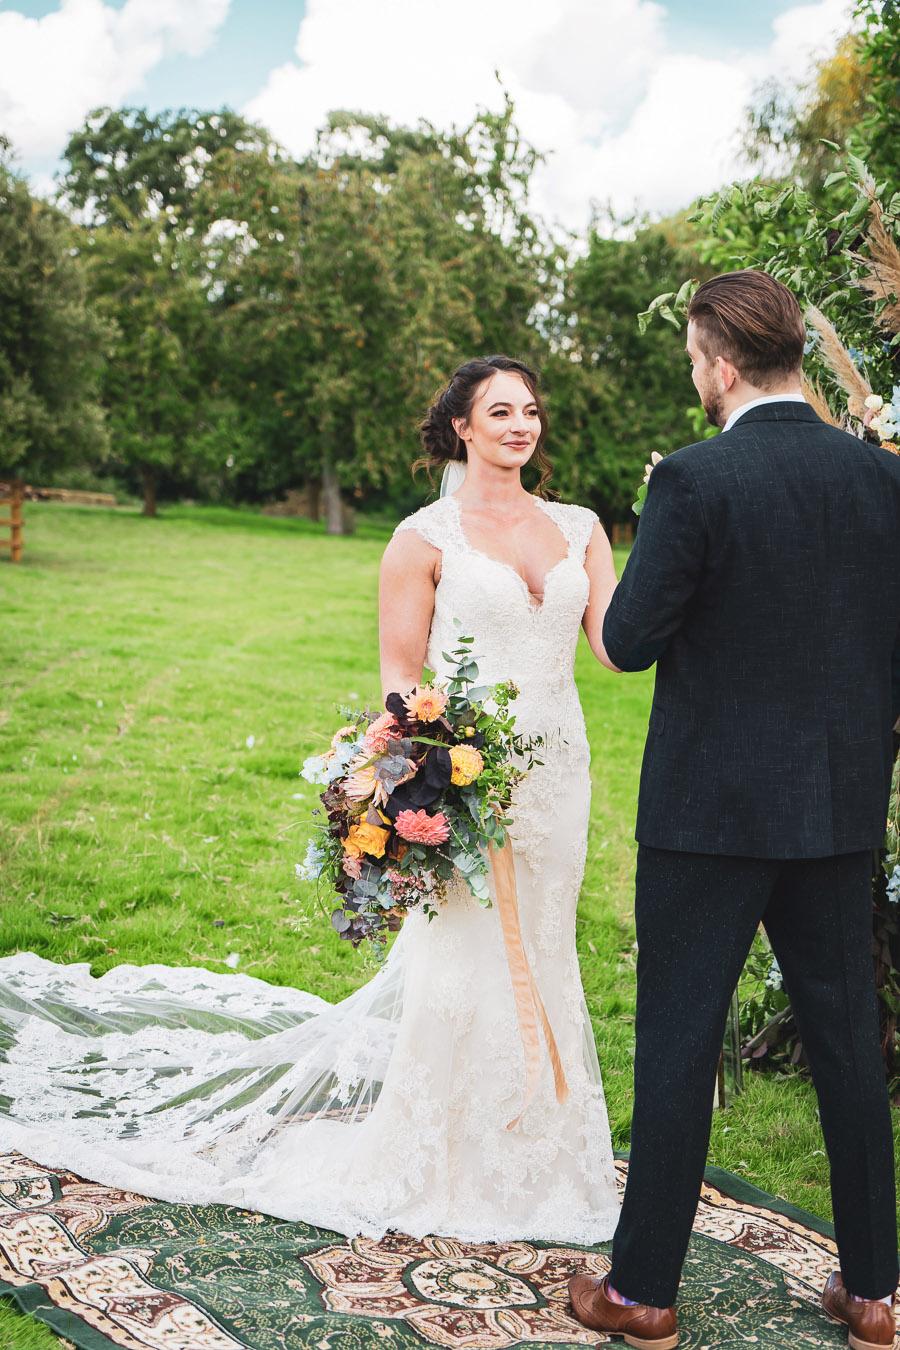 Sophisticated Boho - The New Intimate Wedding (5)